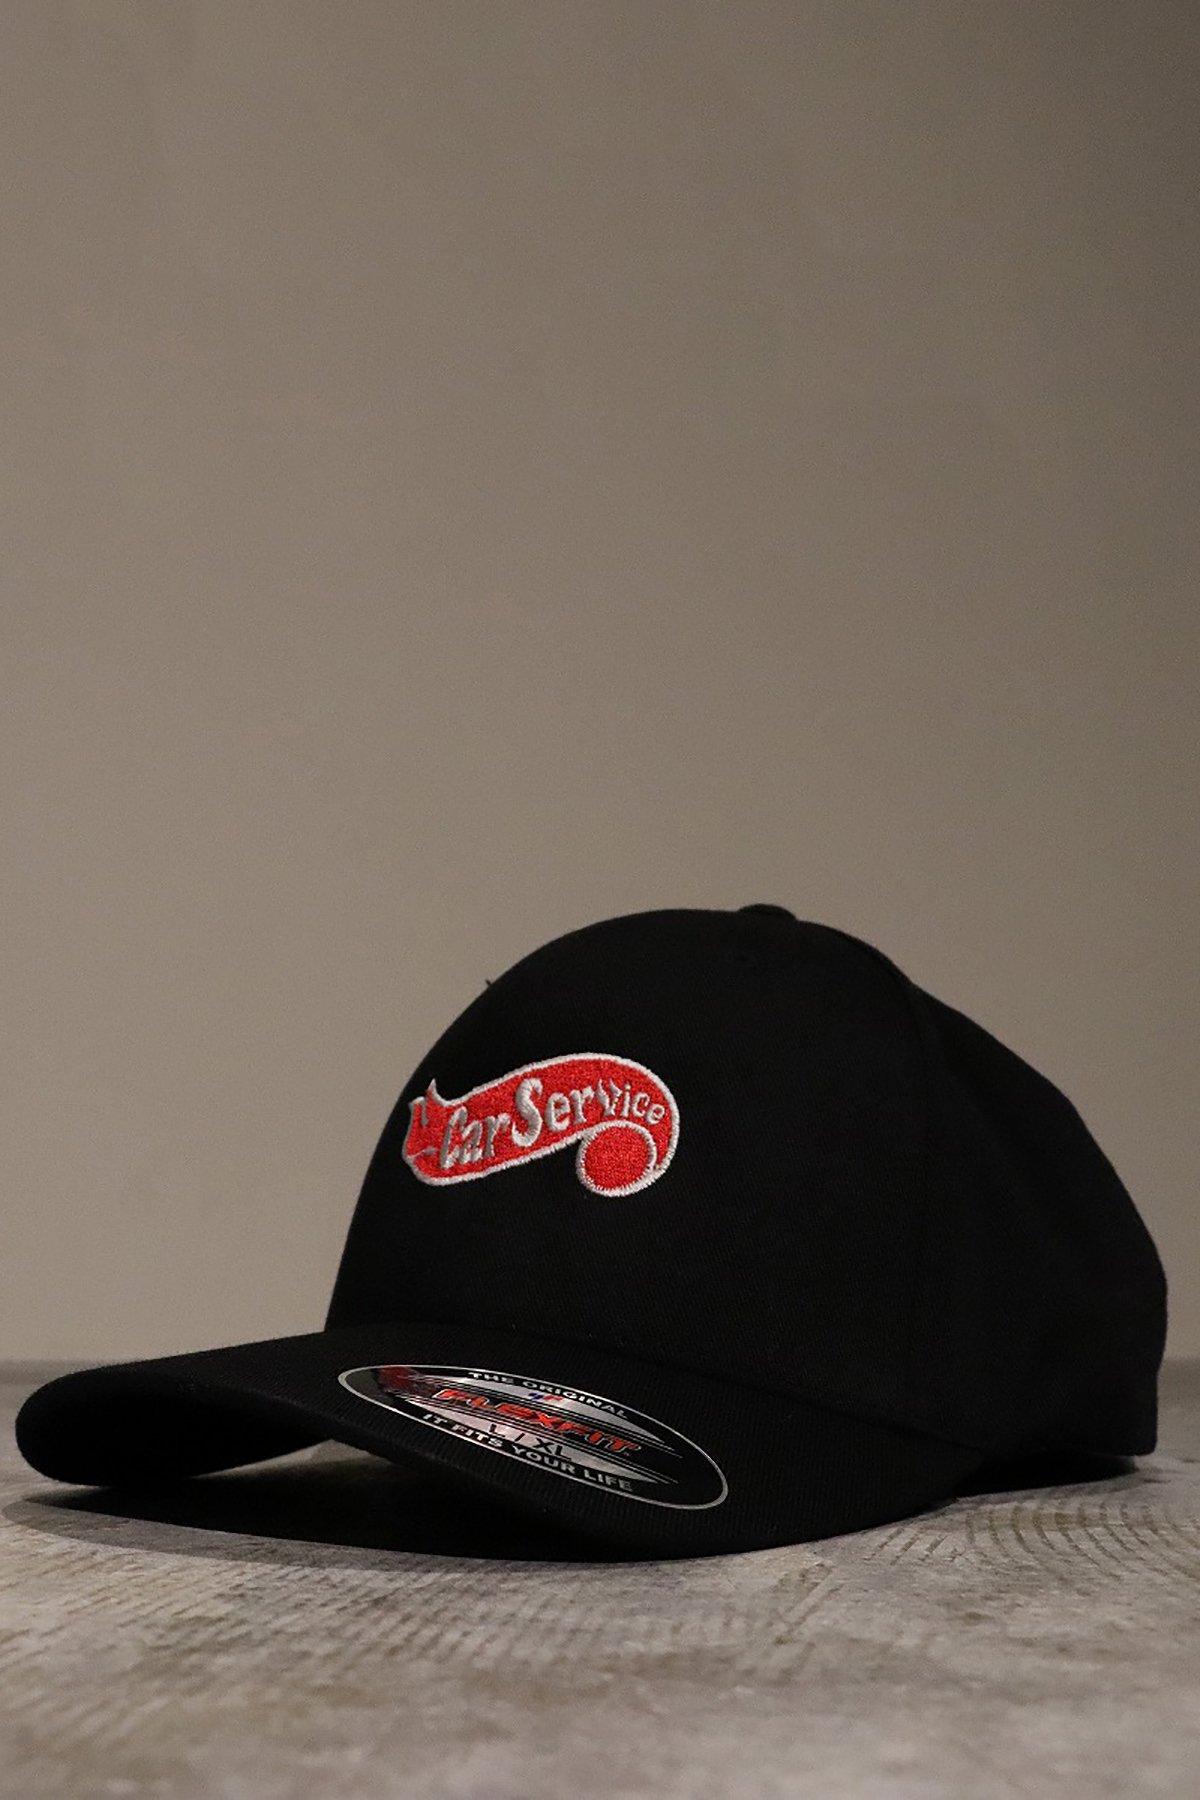 Carservice / LOGO CAP